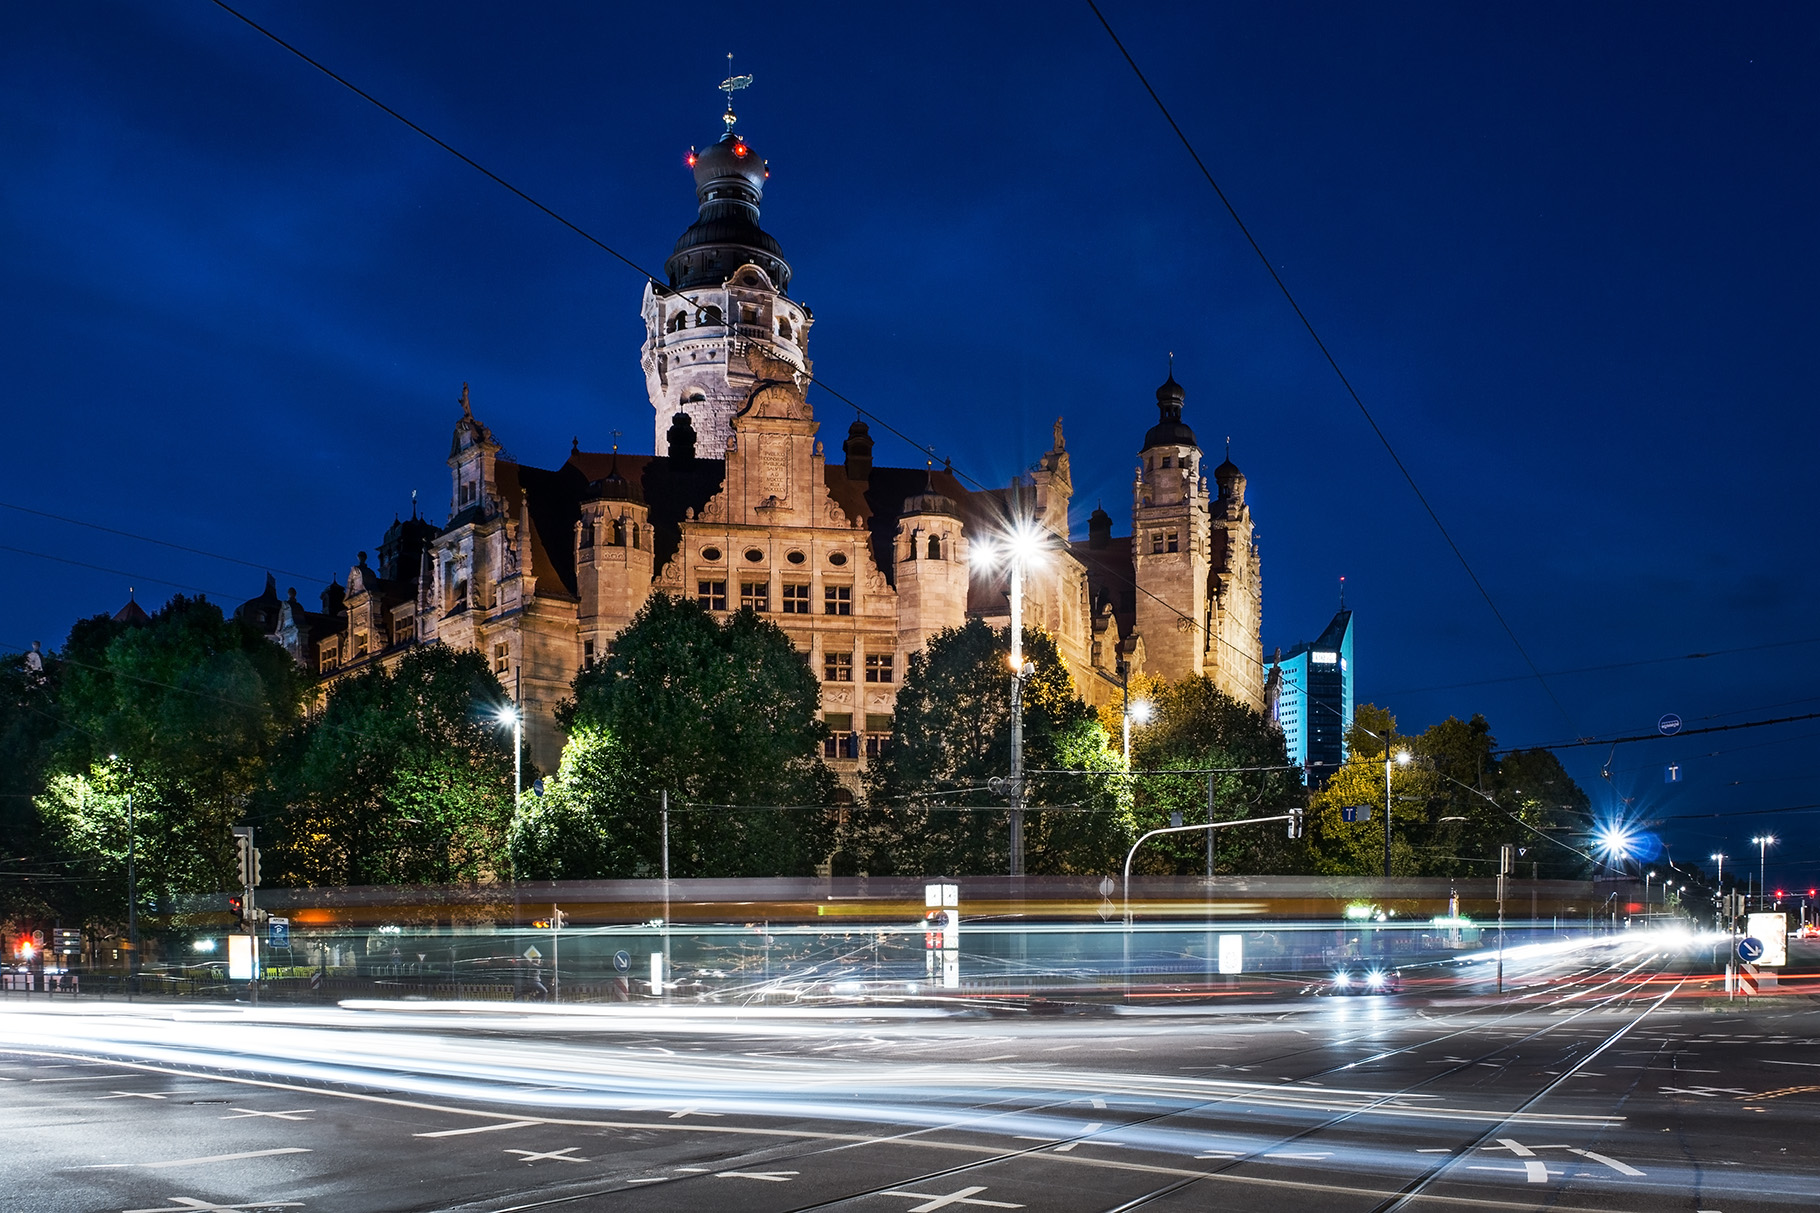 Neues Rathaus Leipzig, Germany